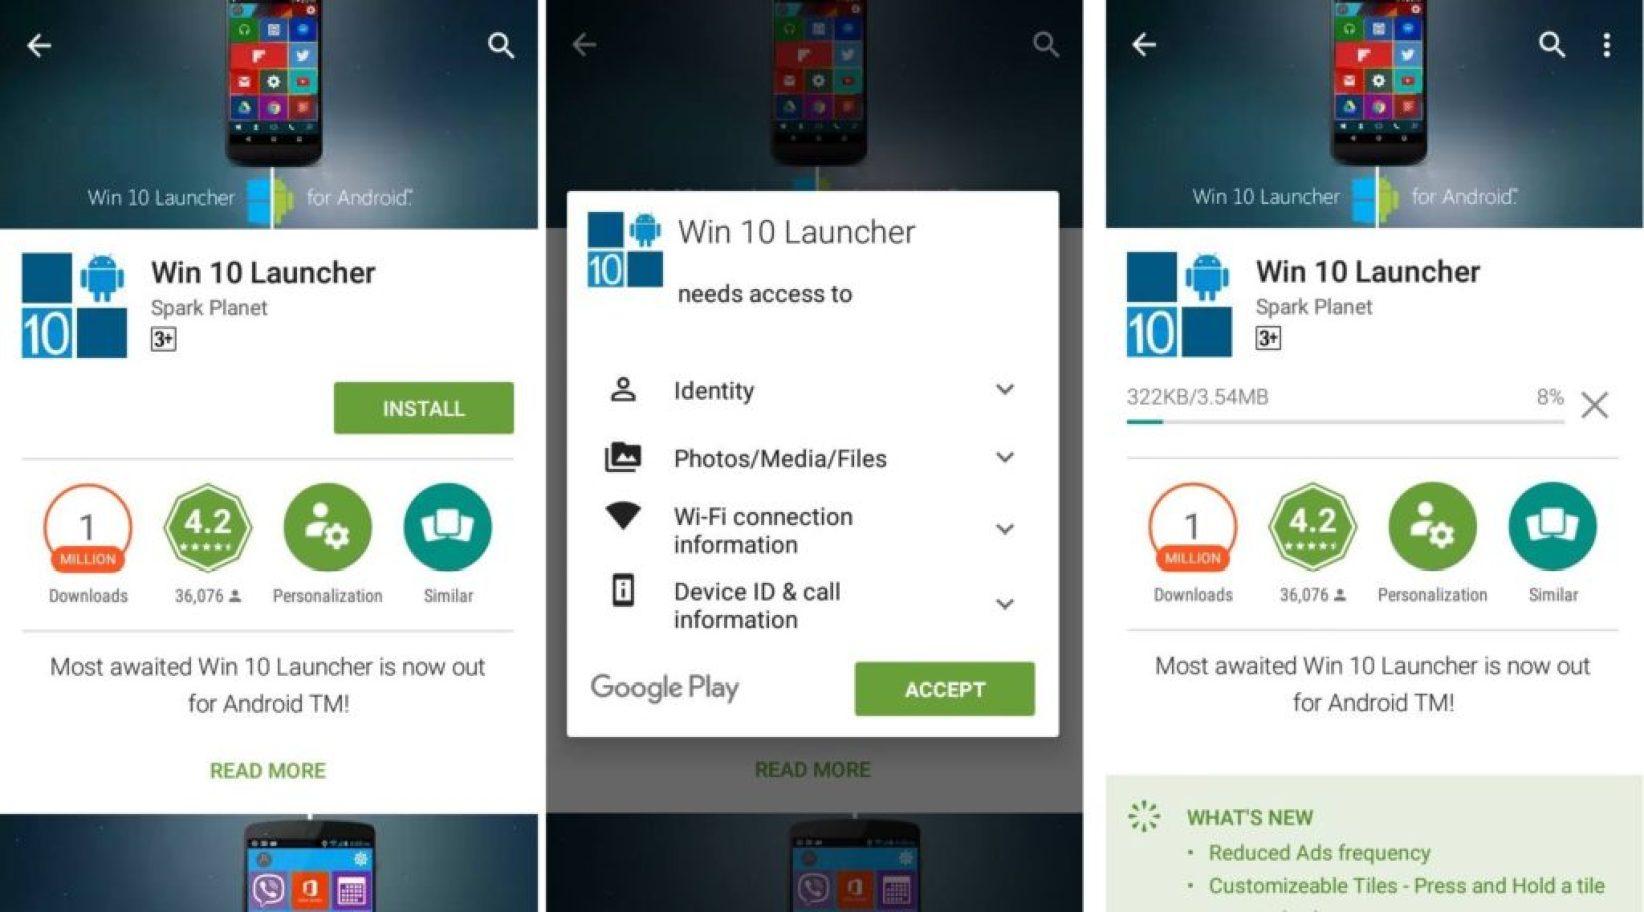 download Windows 10 launcher apk